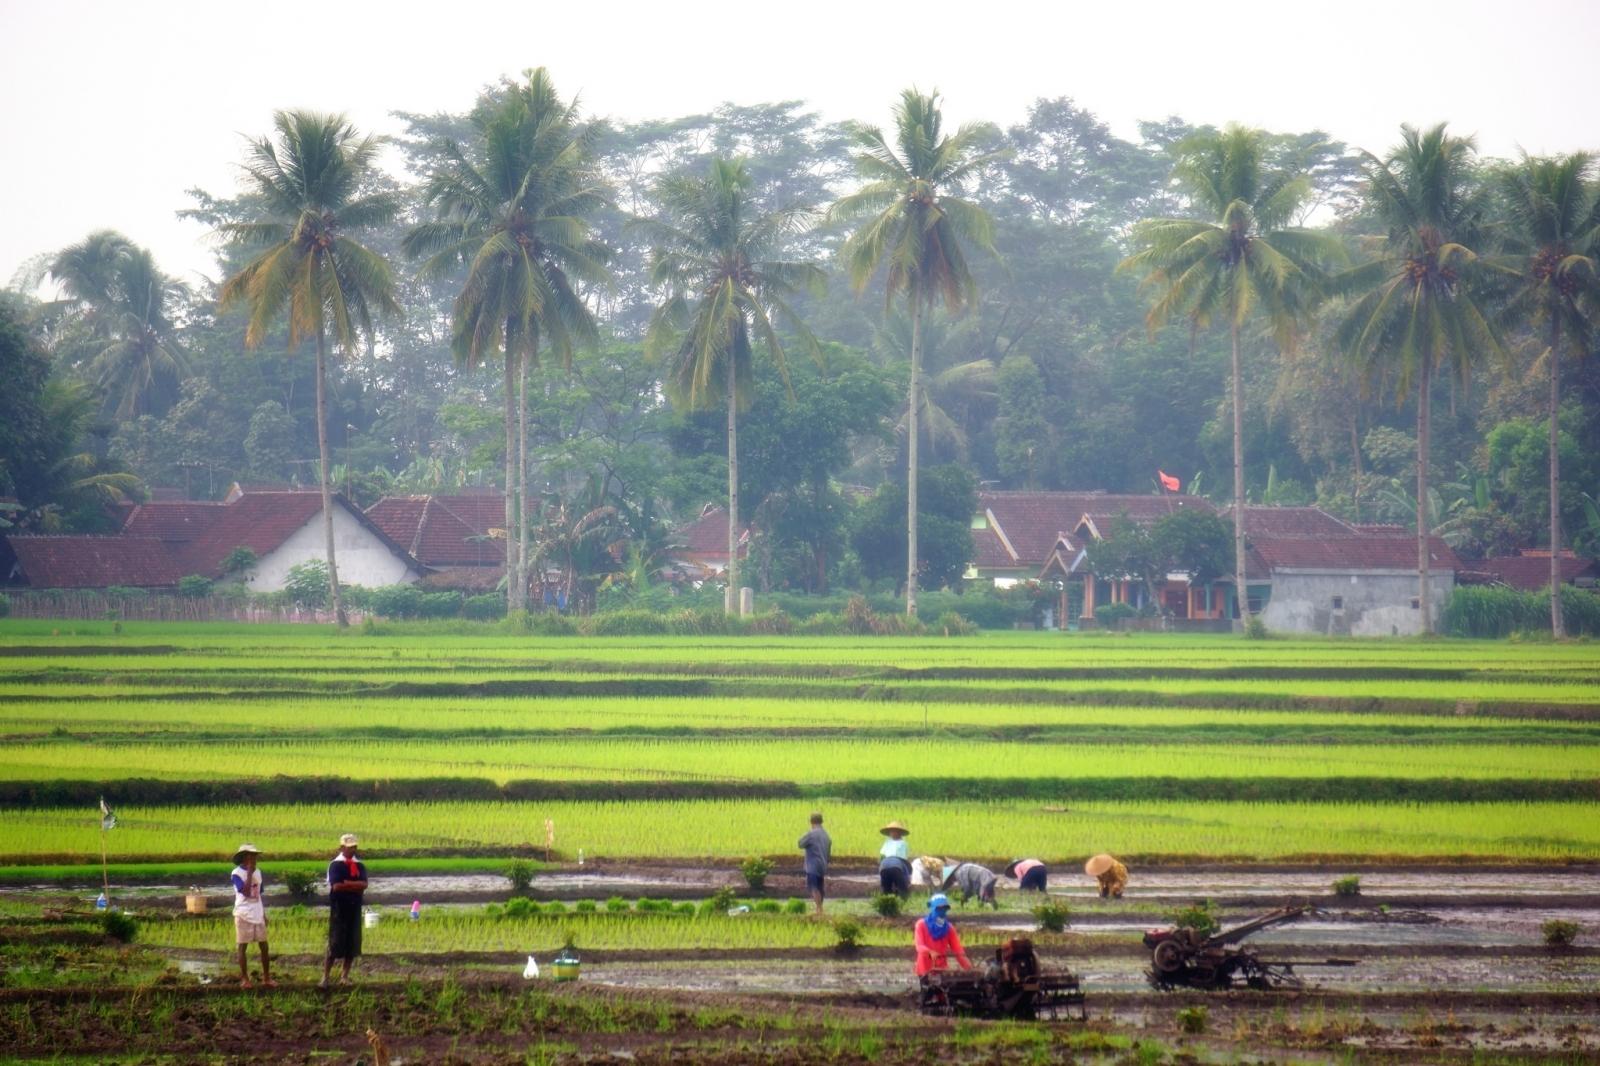 Indonesian farmers